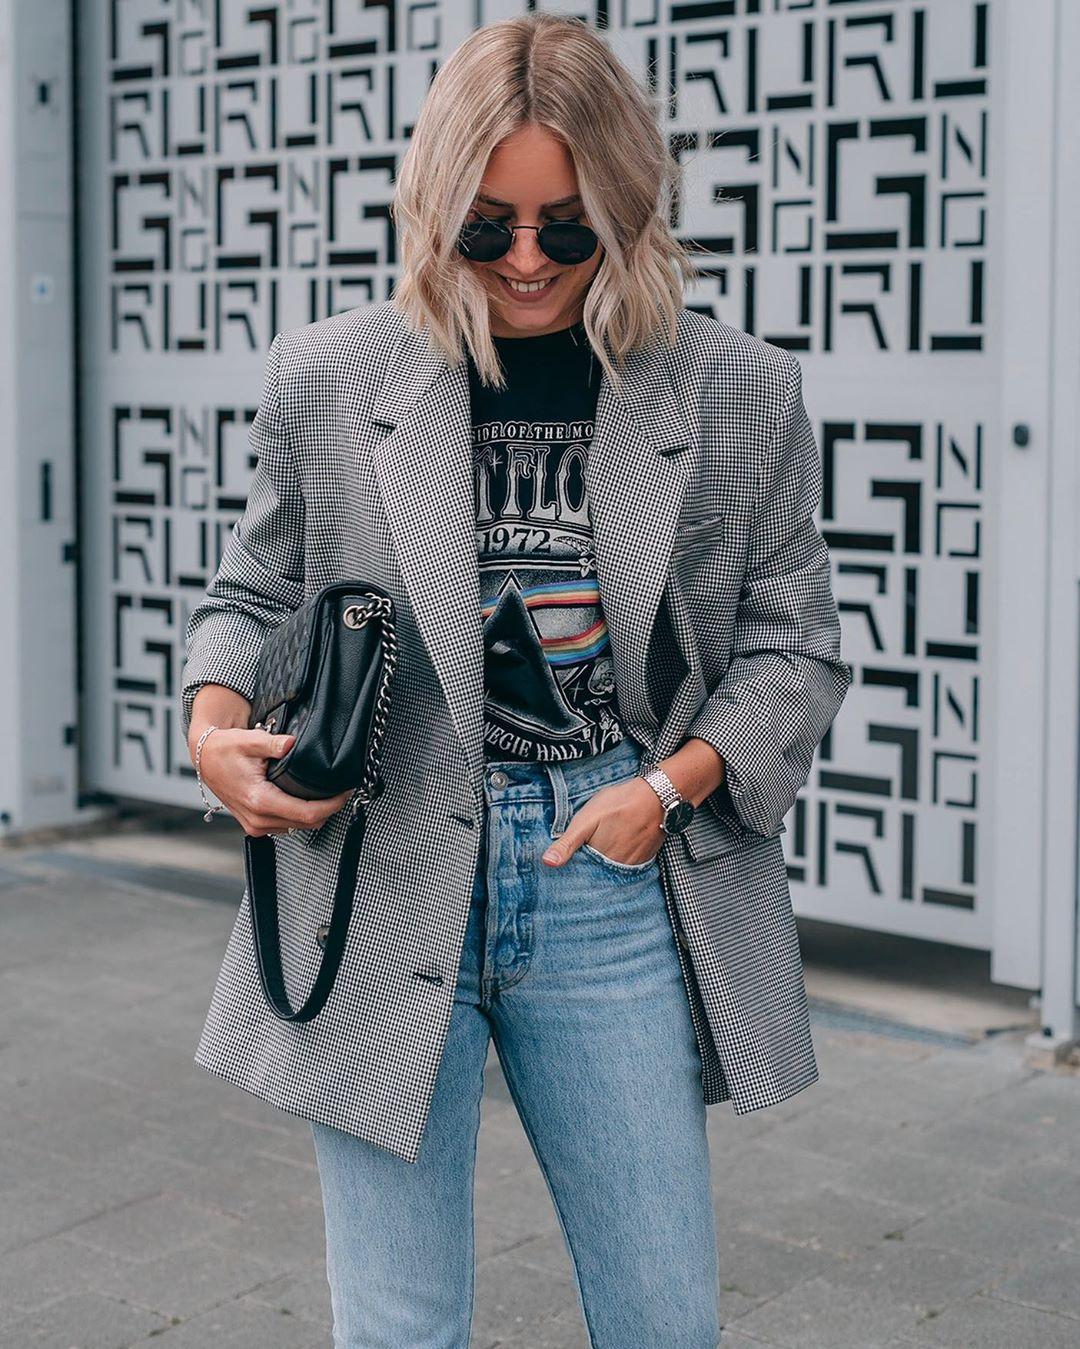 veste à carreaux de Zara sur liangalliard